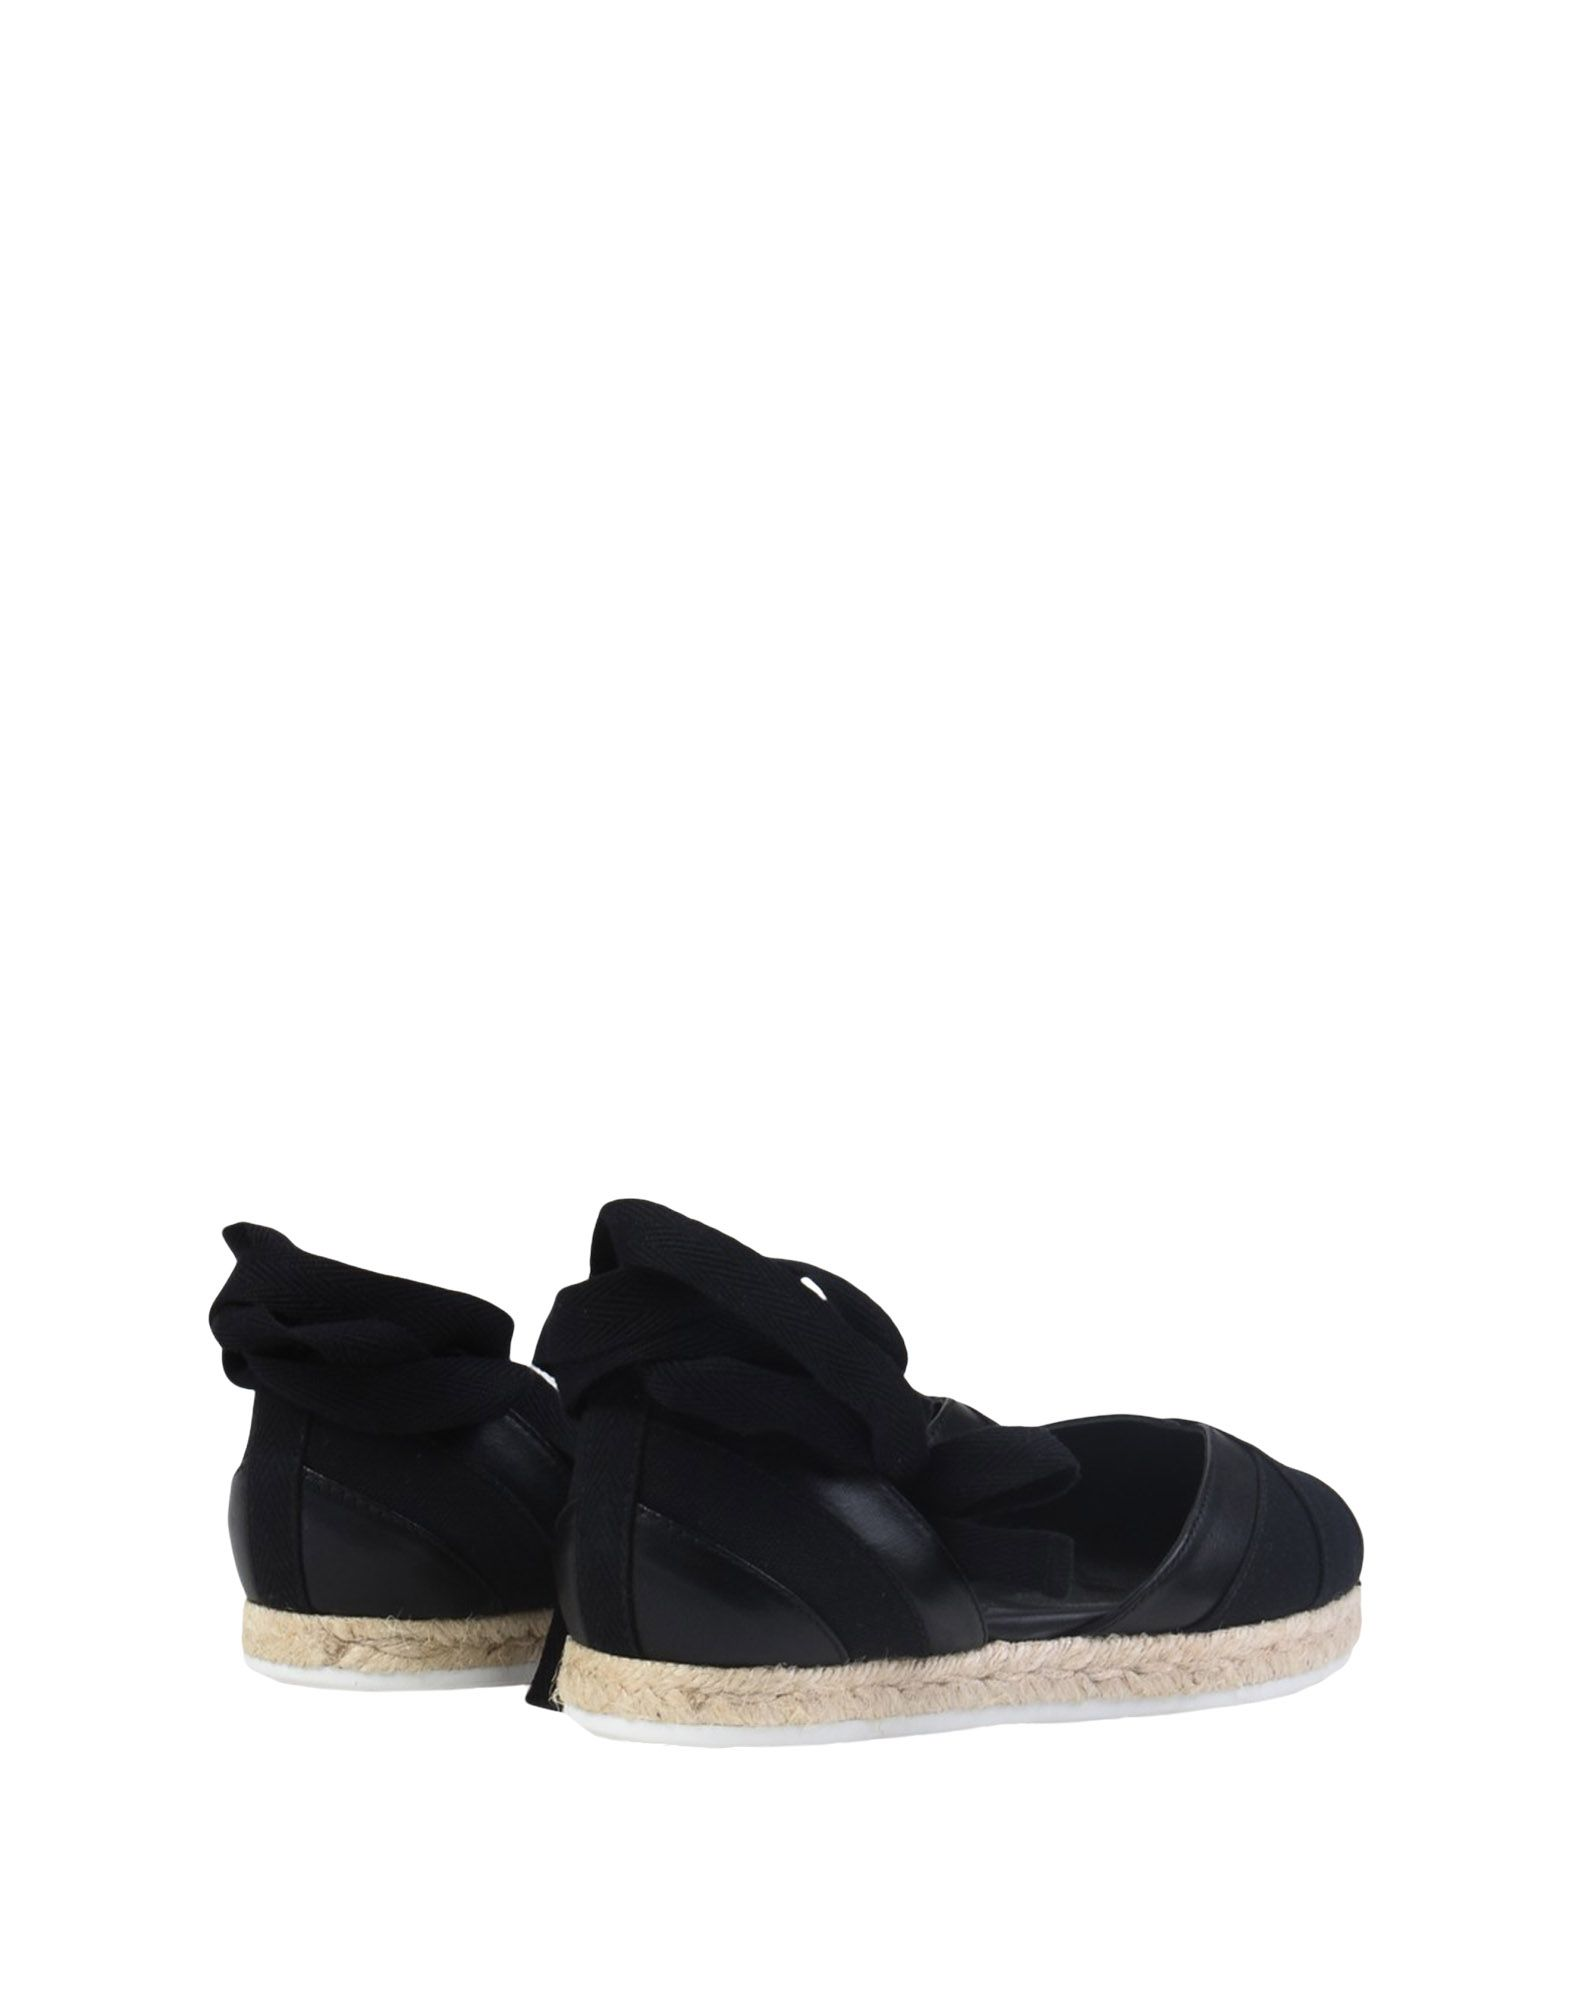 Stilvolle billige Schuhe  Pierre Hardy Espadrilles Damen  Schuhe 11428008SC ed66cc